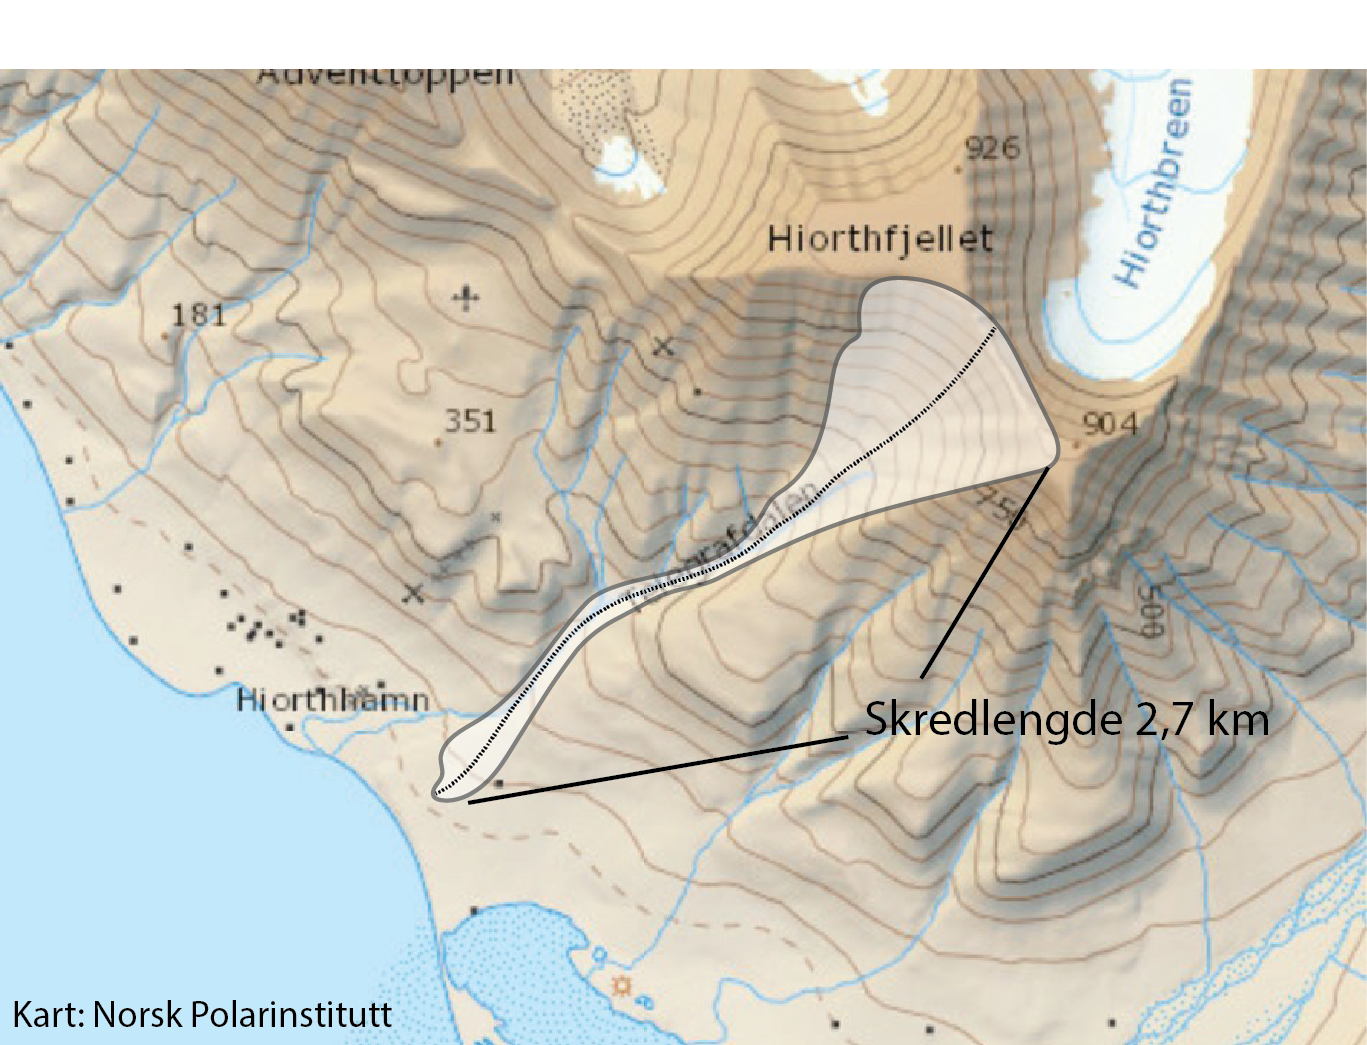 Continuous avalanche danger around Longyearbyen